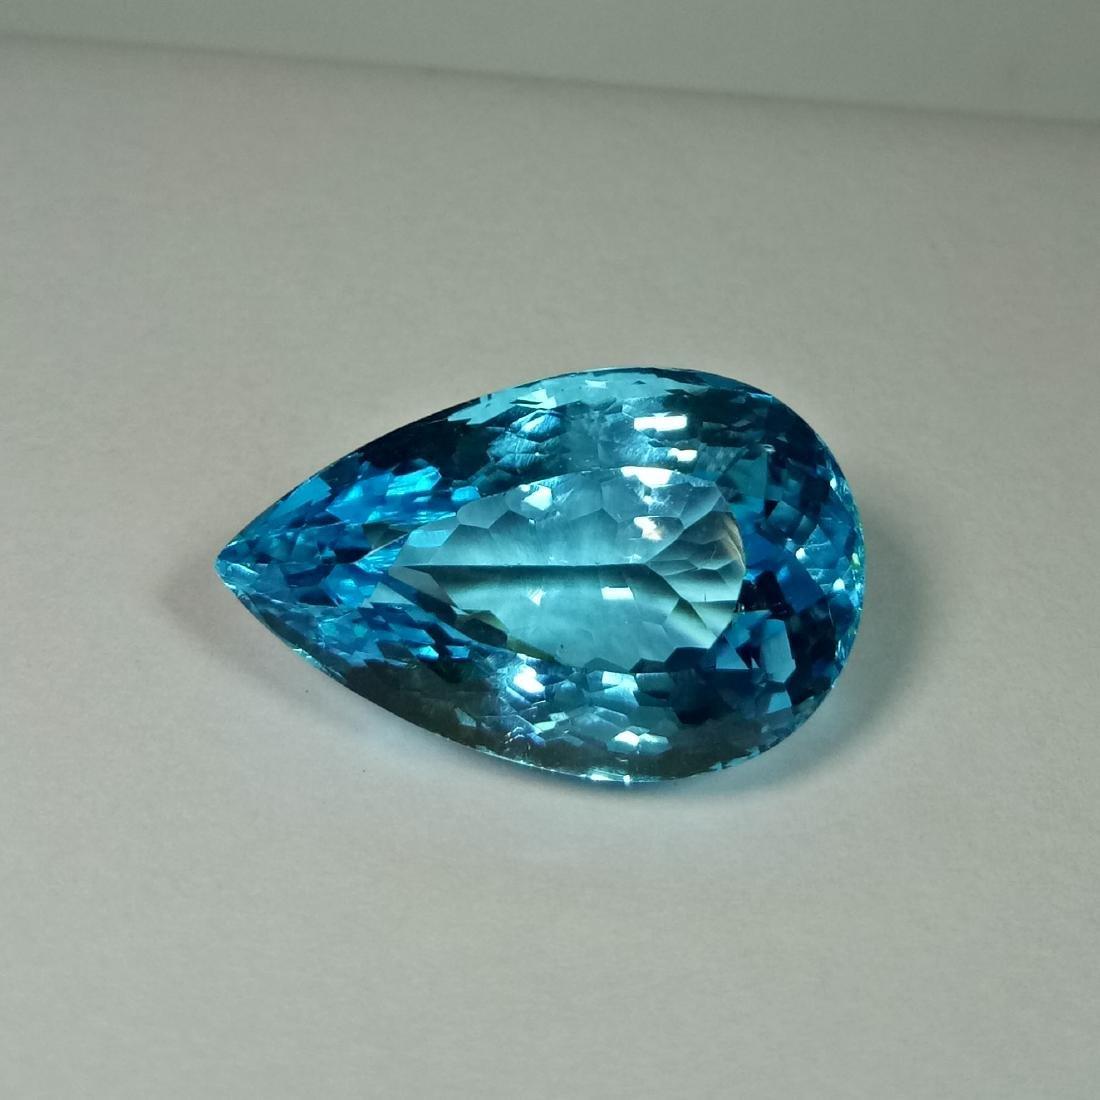 Swiss Blue Topaz - 31.60 Carat Loose